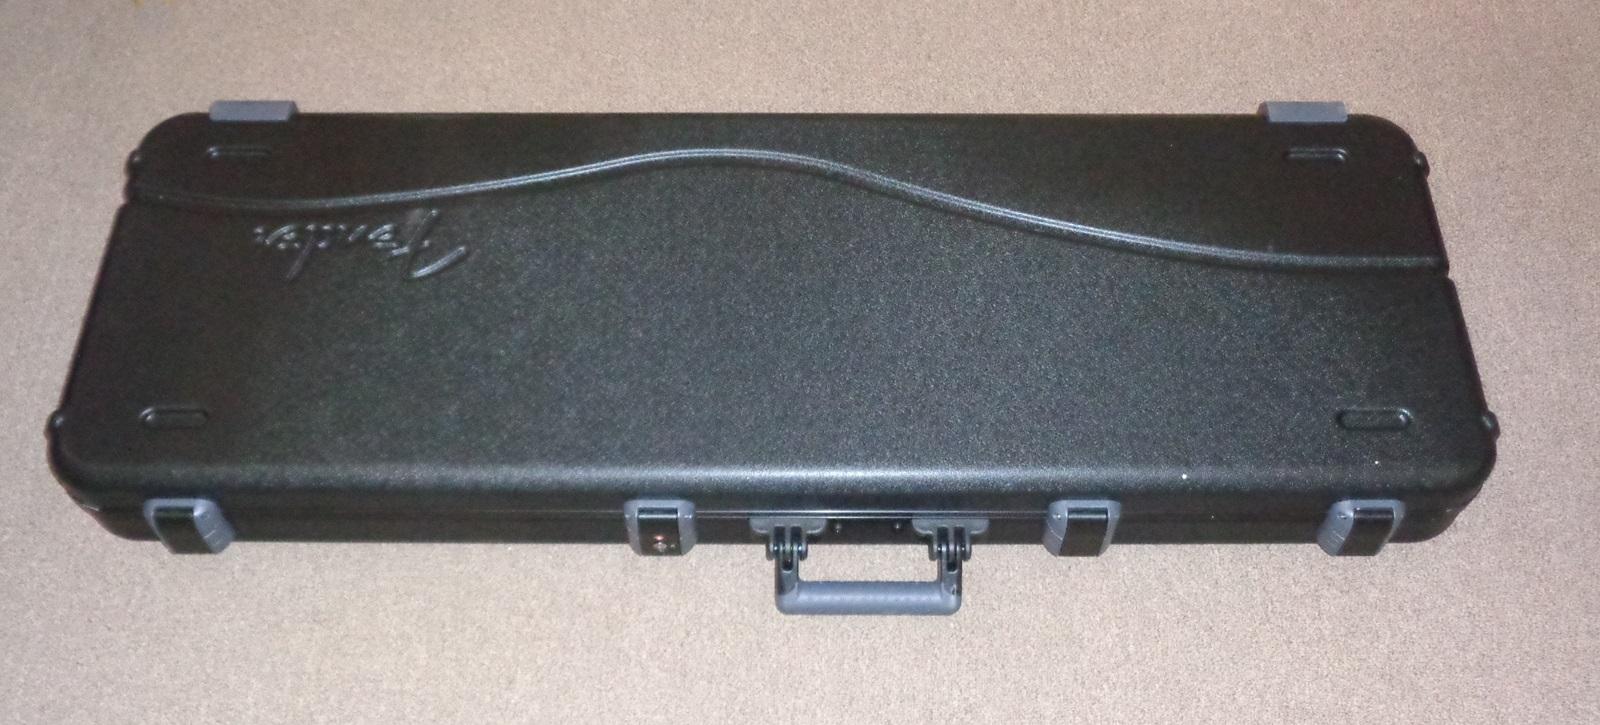 Fender American Elite Jazz Bass V Maple Fingerboard Tobacco Burst 3 Way Switch W Case